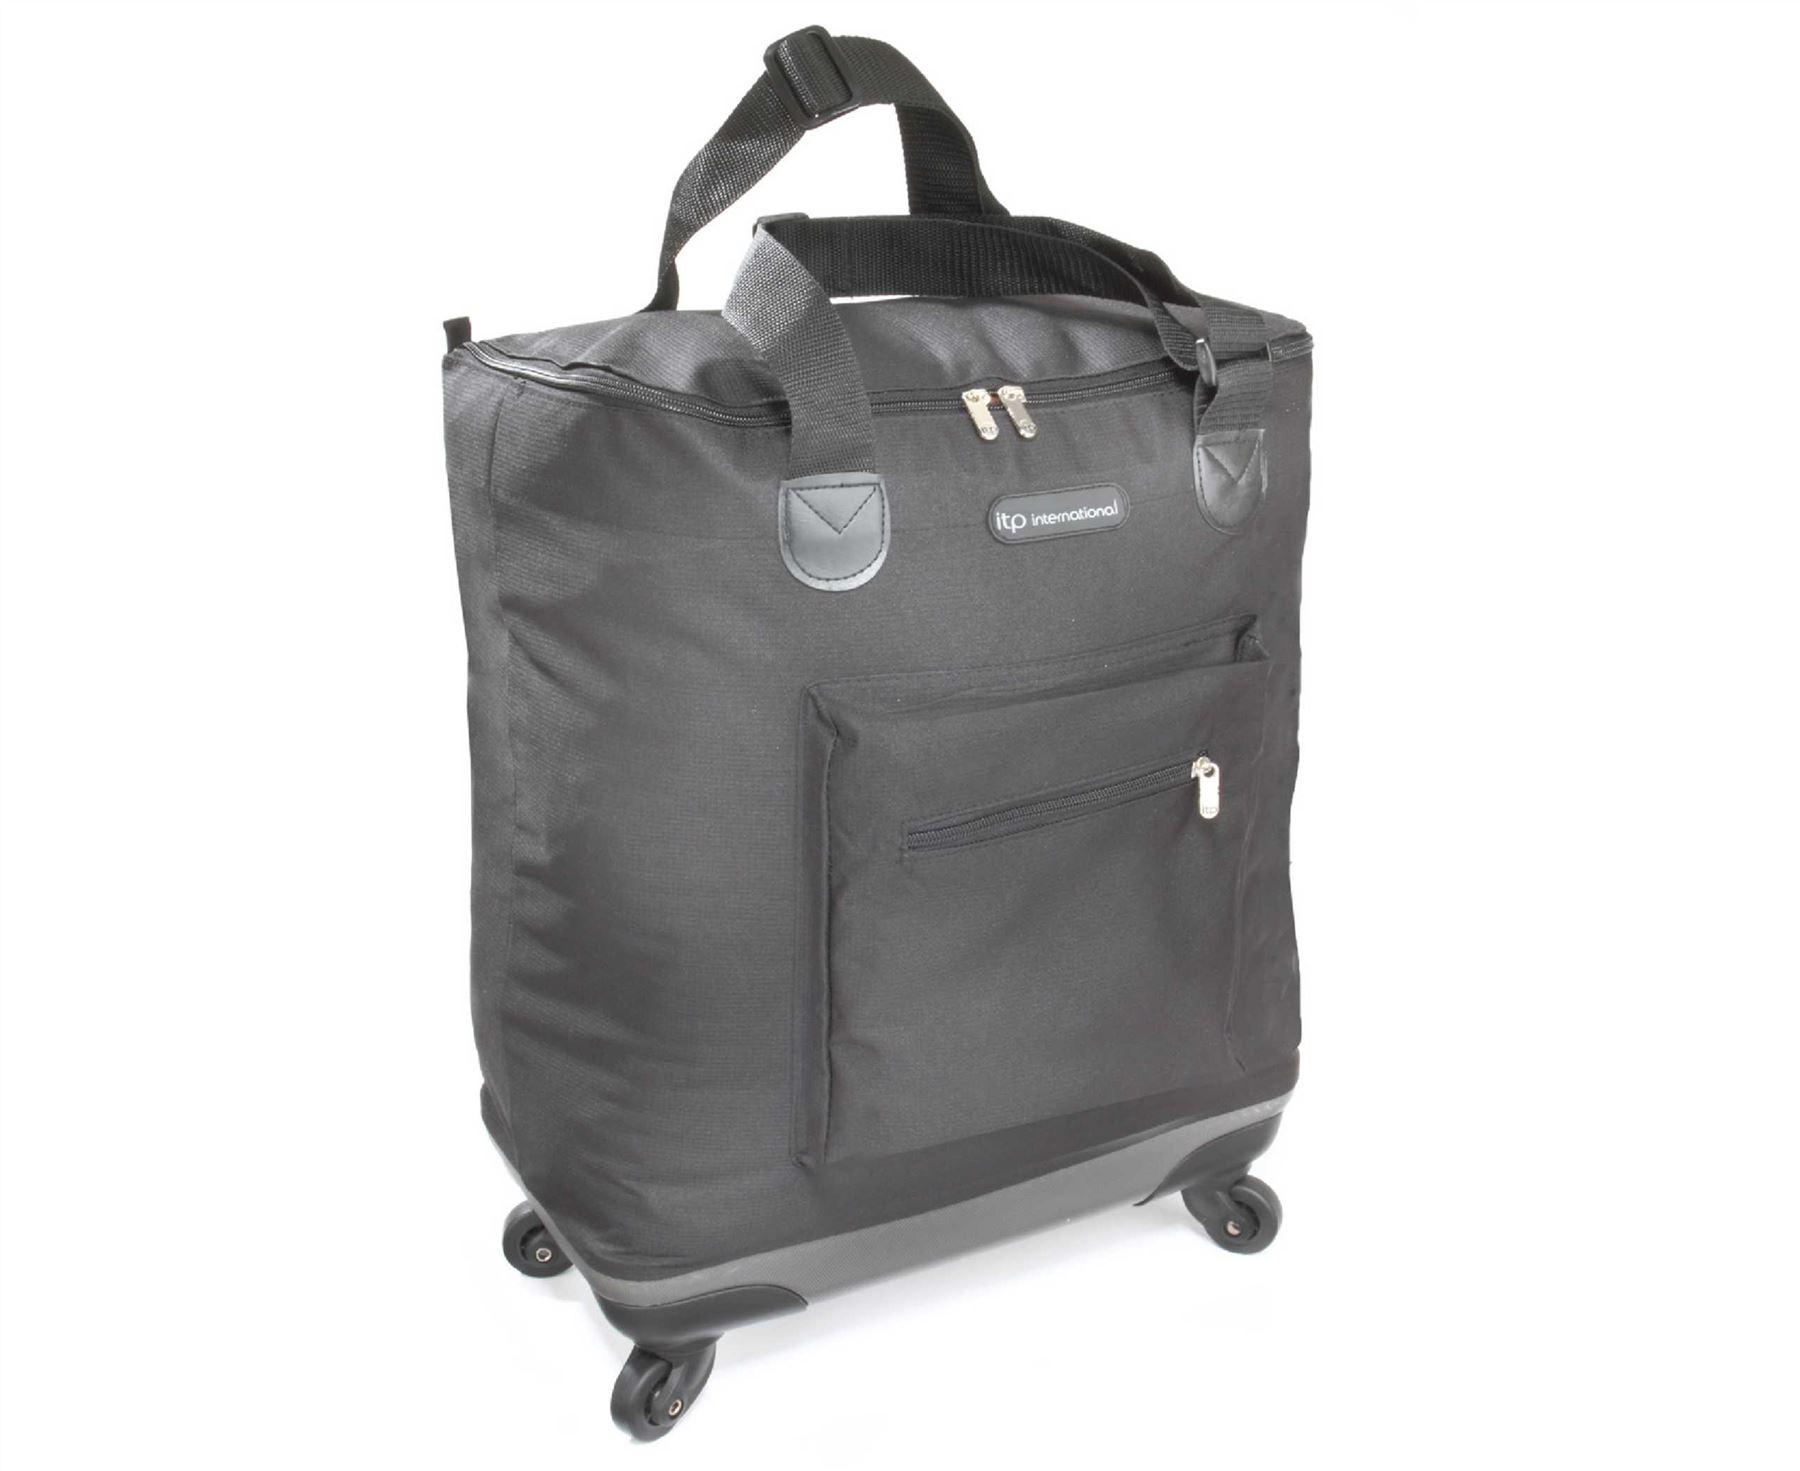 quattro lightweight folding bag on wheels shopping trips travel lightweight ebay. Black Bedroom Furniture Sets. Home Design Ideas